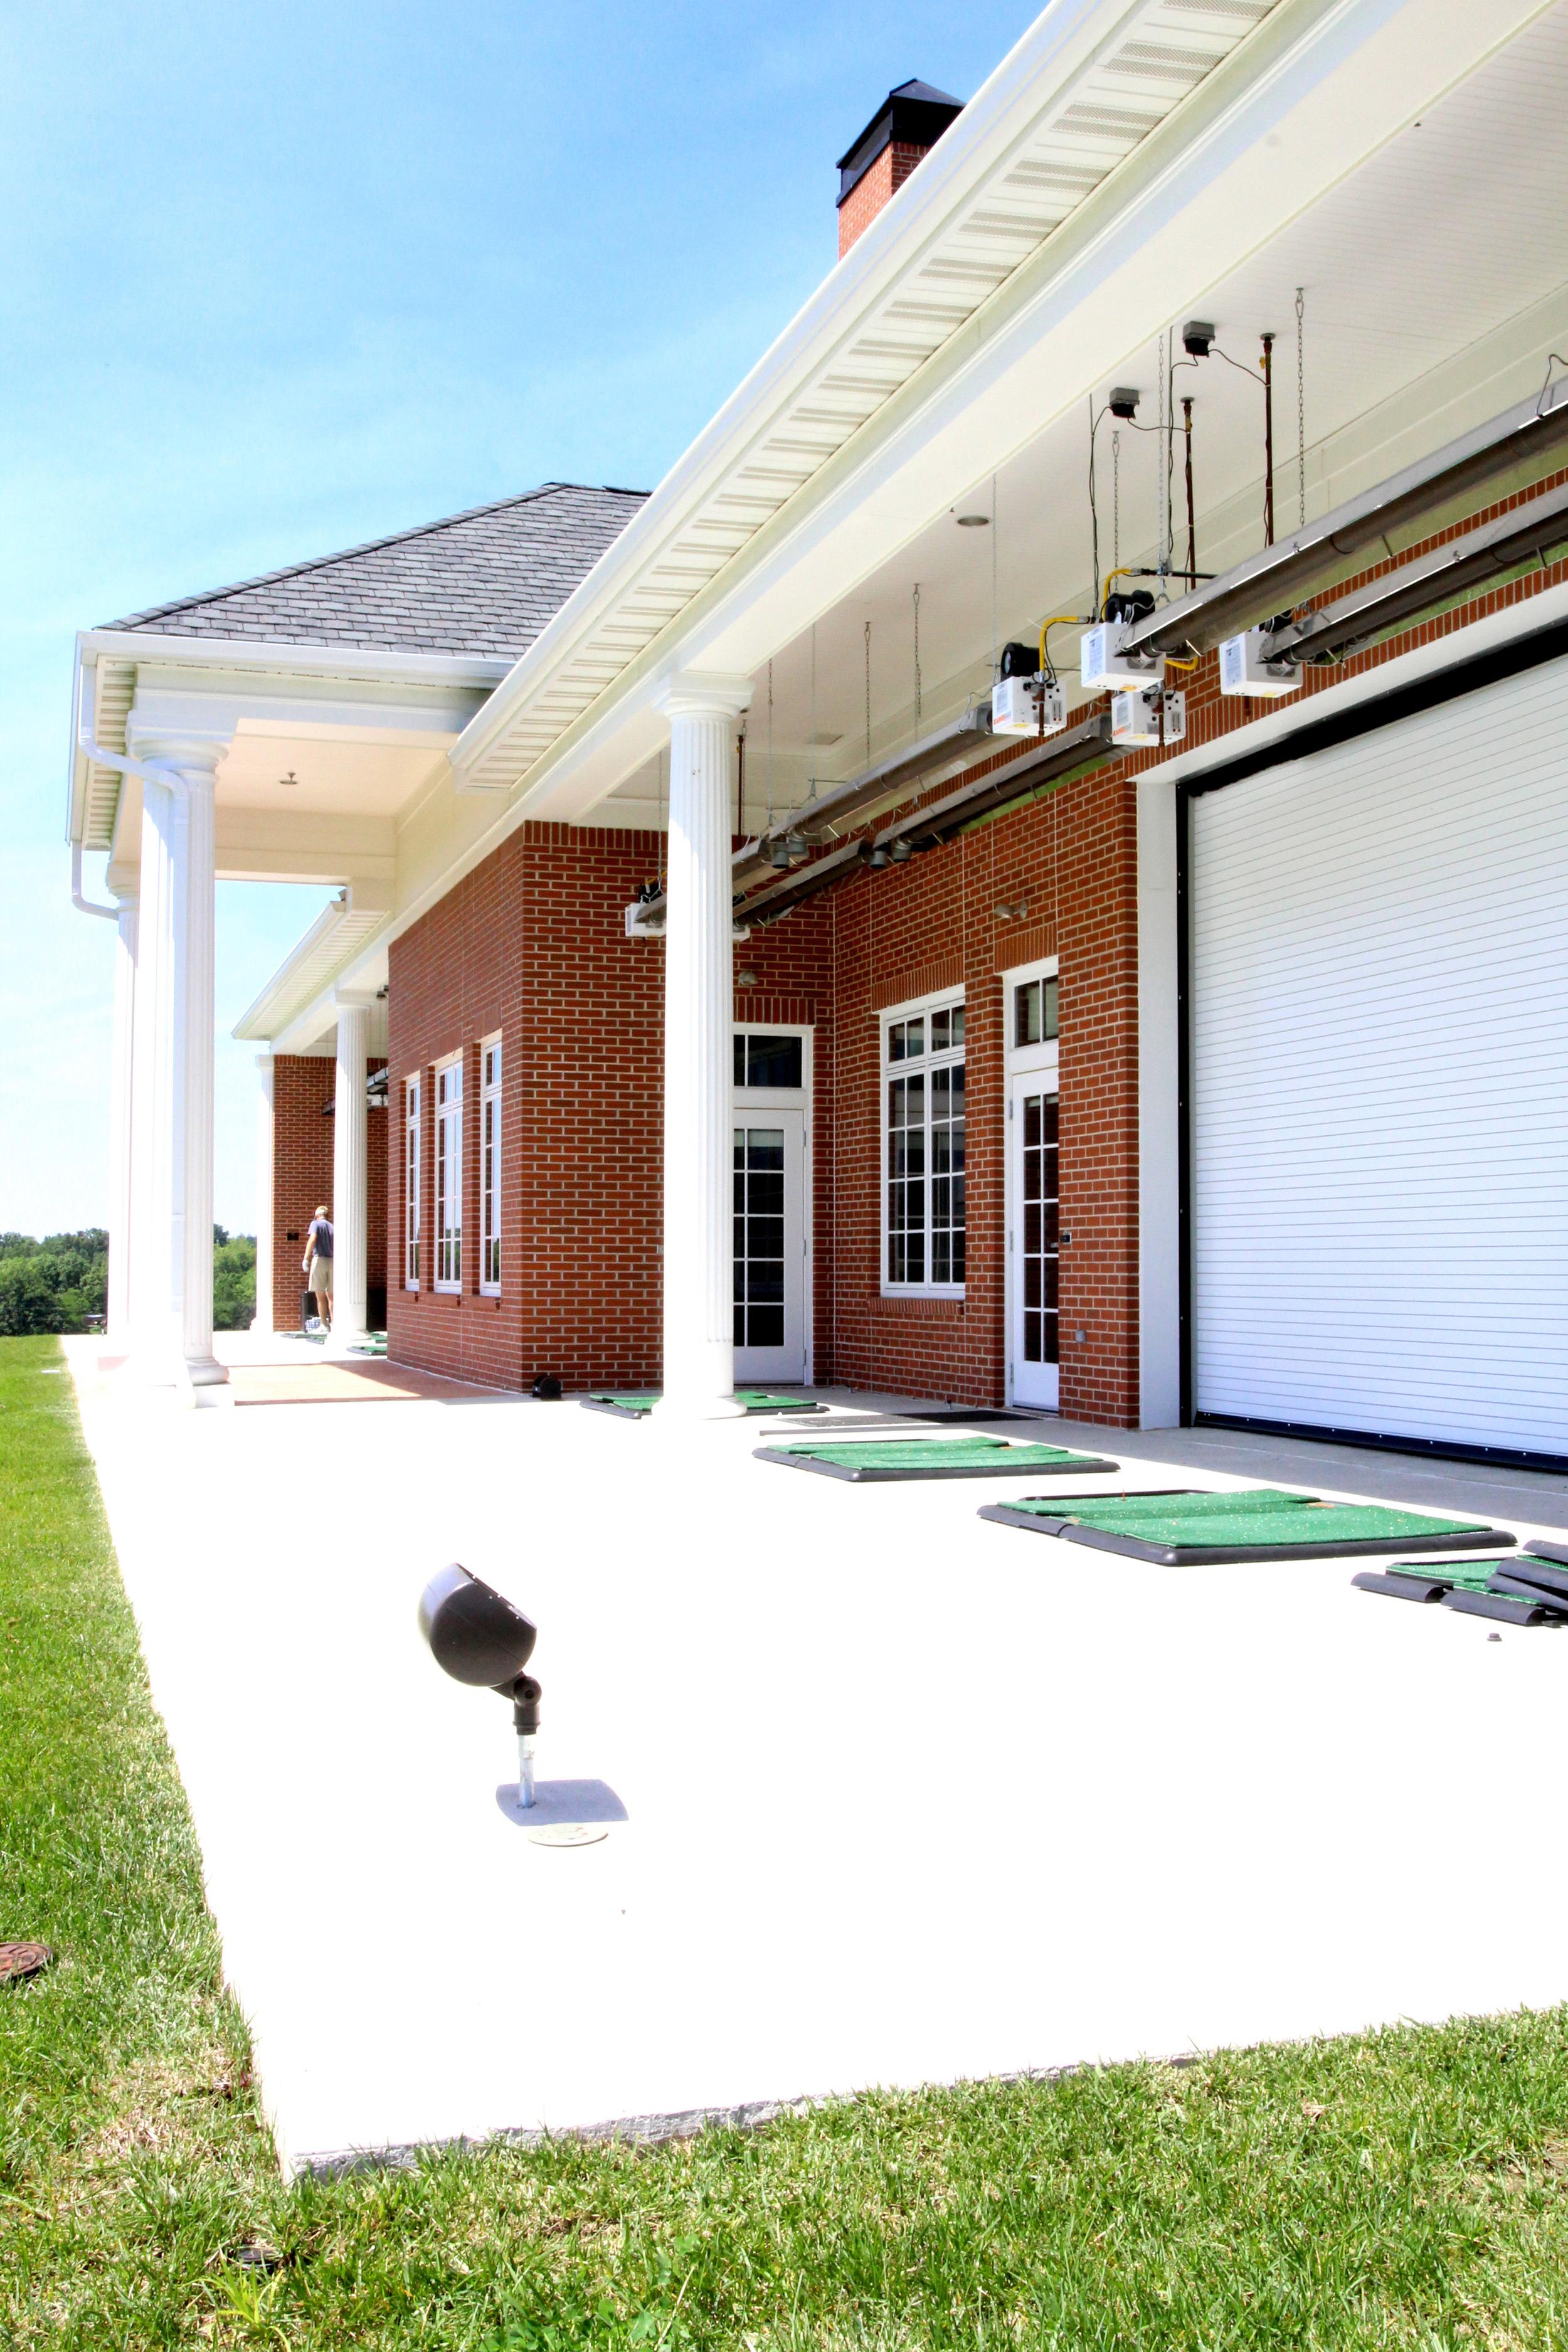 old-hawthorne-new-home-community-mizzou-golf-facility-columbia-mo-girard-homes